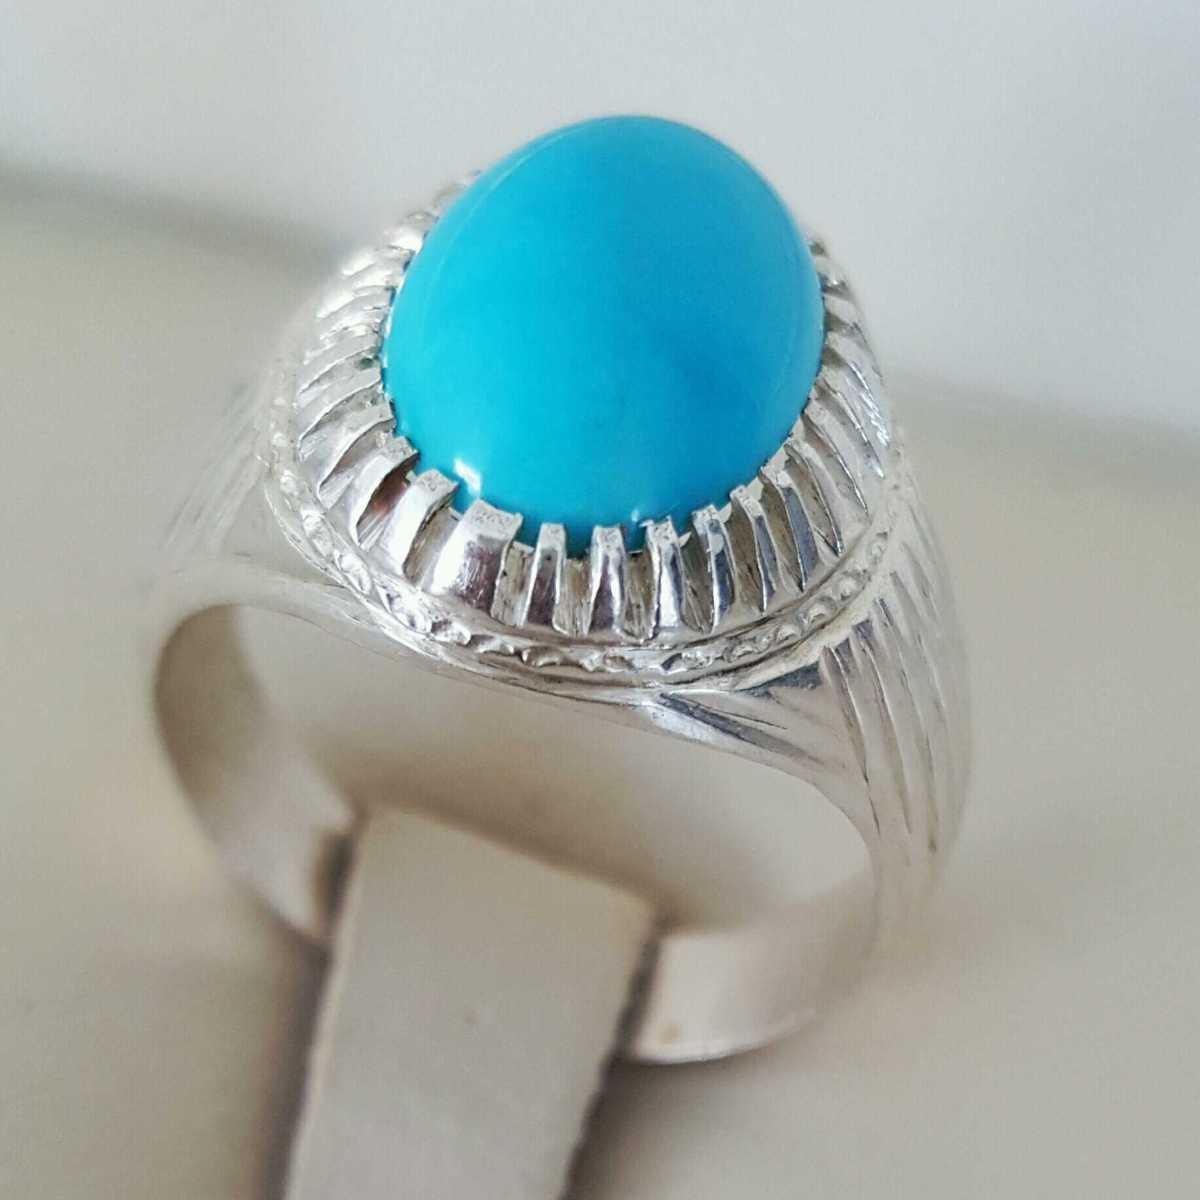 Real Silver 925 Jewellery Buy in Pakistan 8 natural gemstones pakistan + 925 silver jewelry online